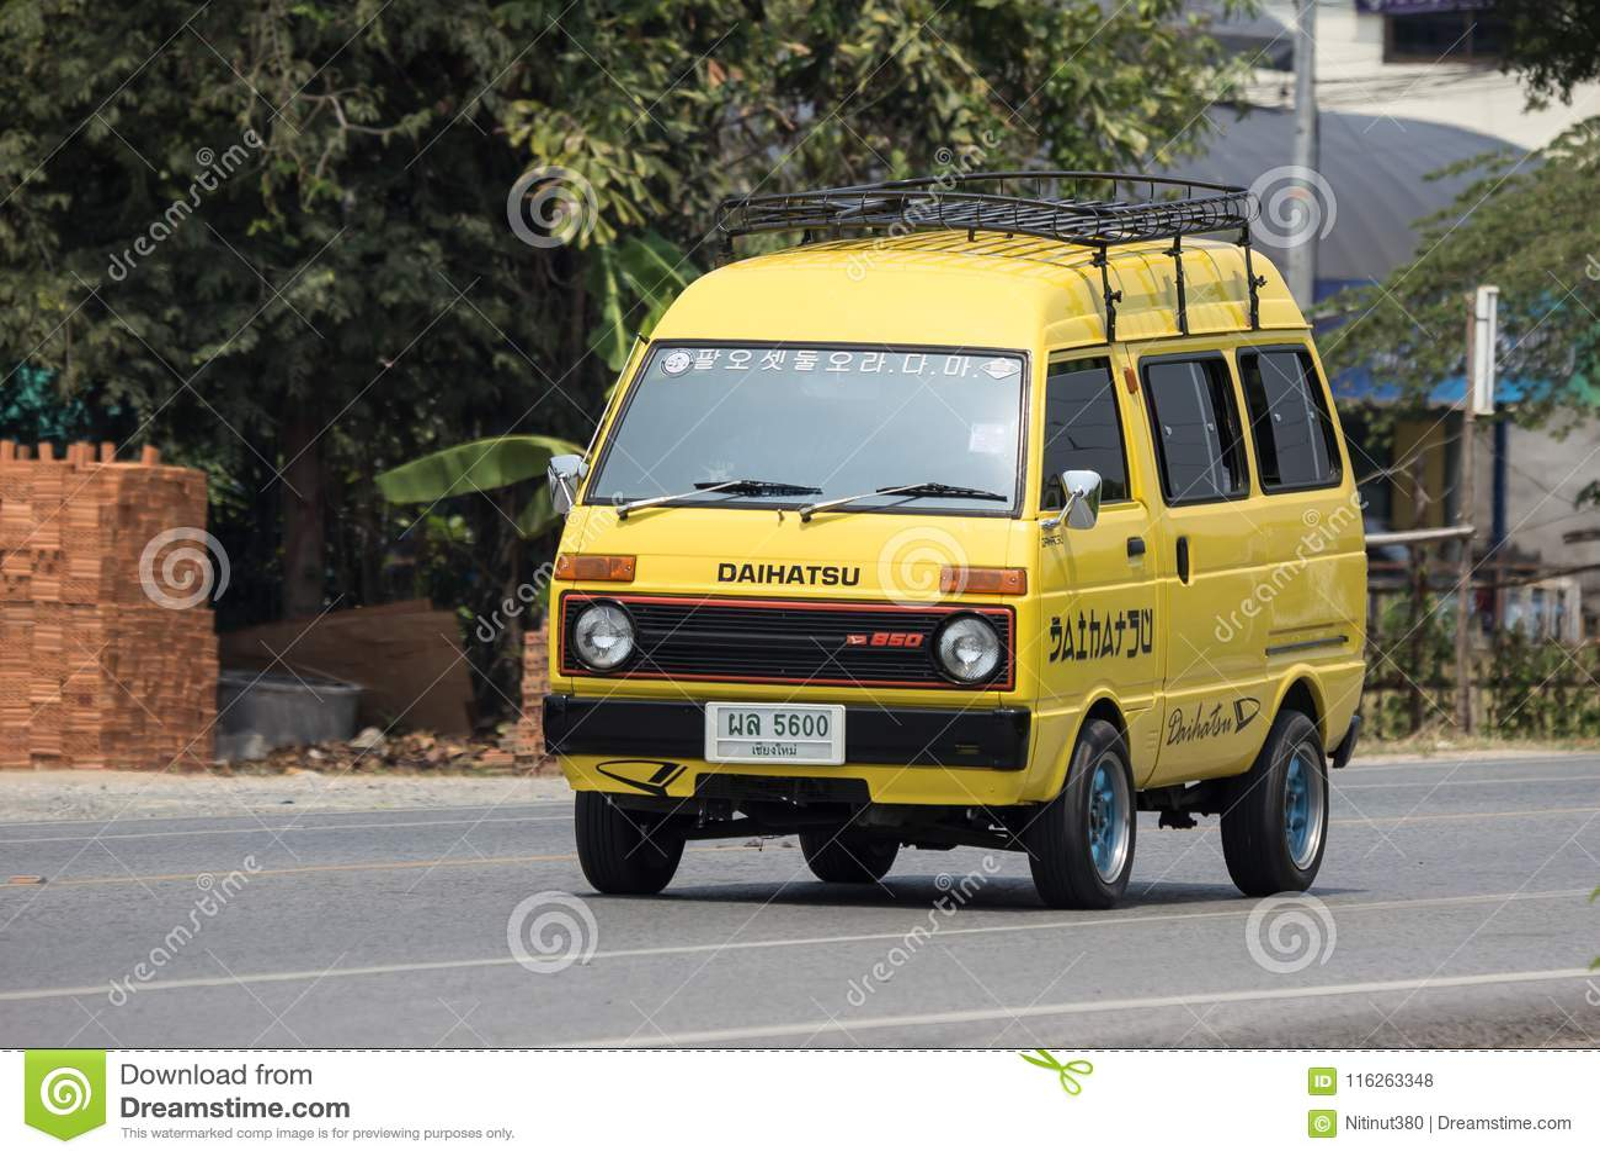 Private Daihatsu Old Van Car Editorial Stock Photo Image Of Speed